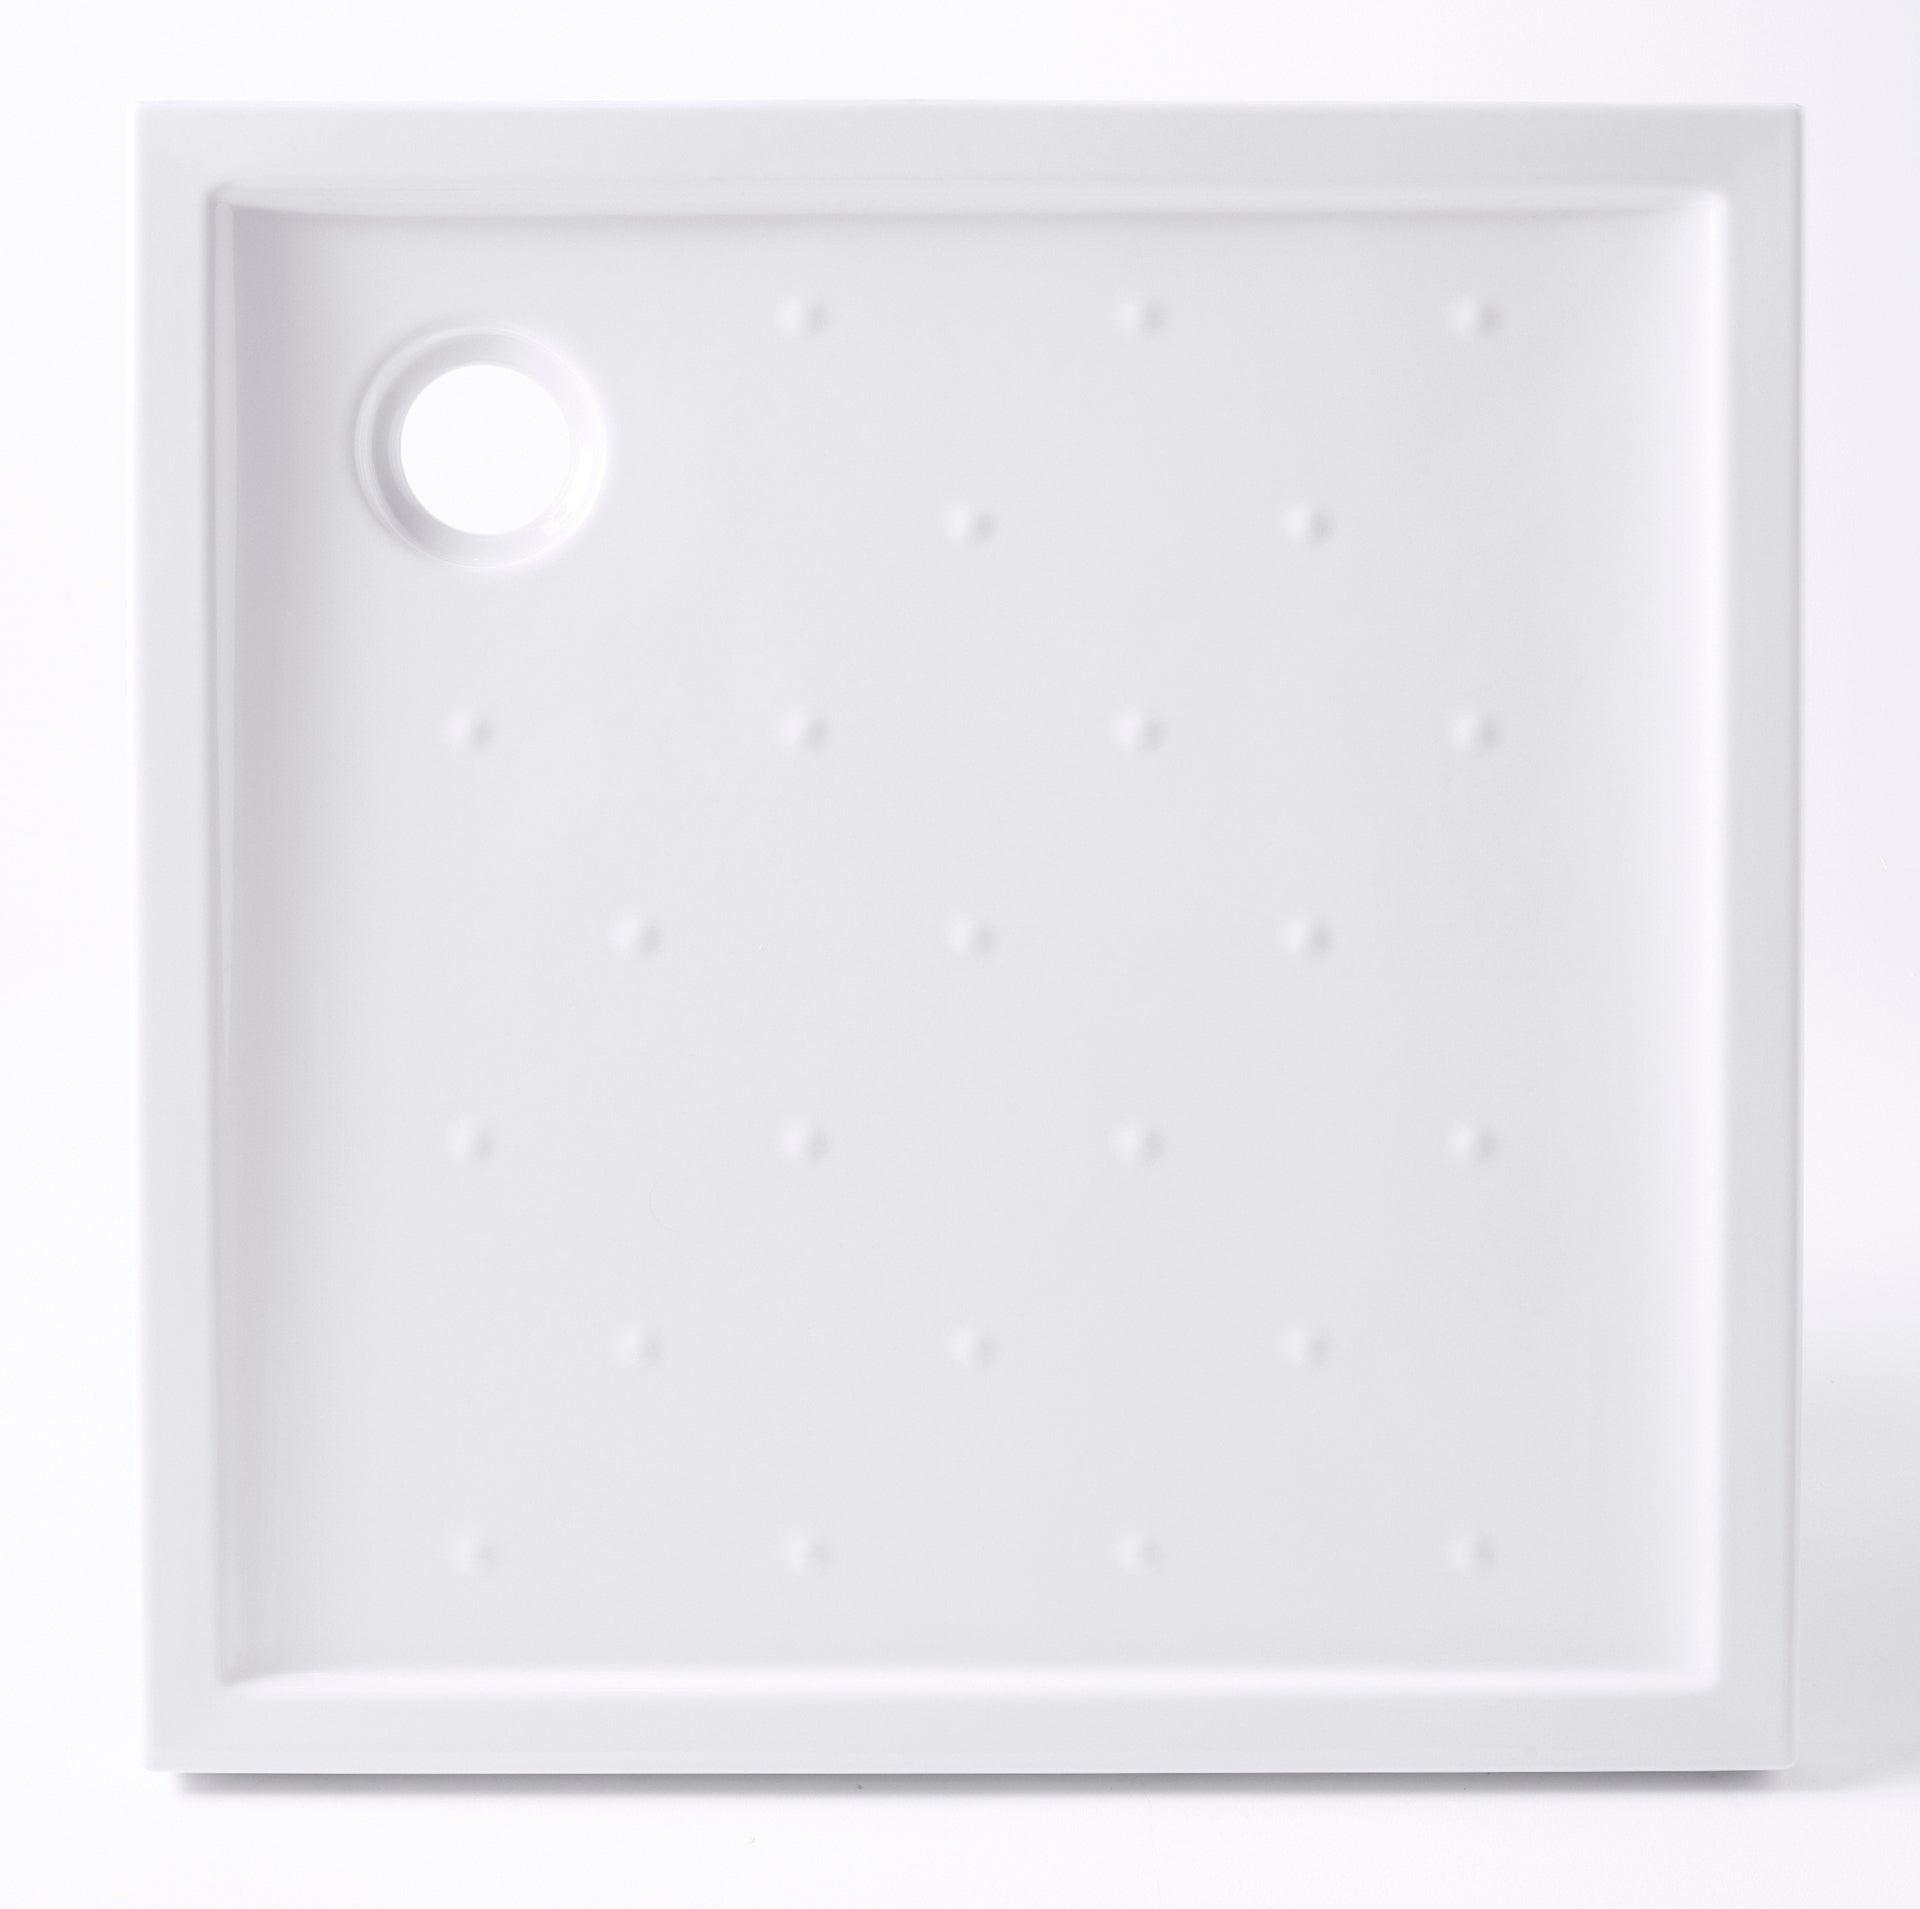 2,5 cm Receveur de douche en marbre min/éral noir 70 x 70 cm Eye